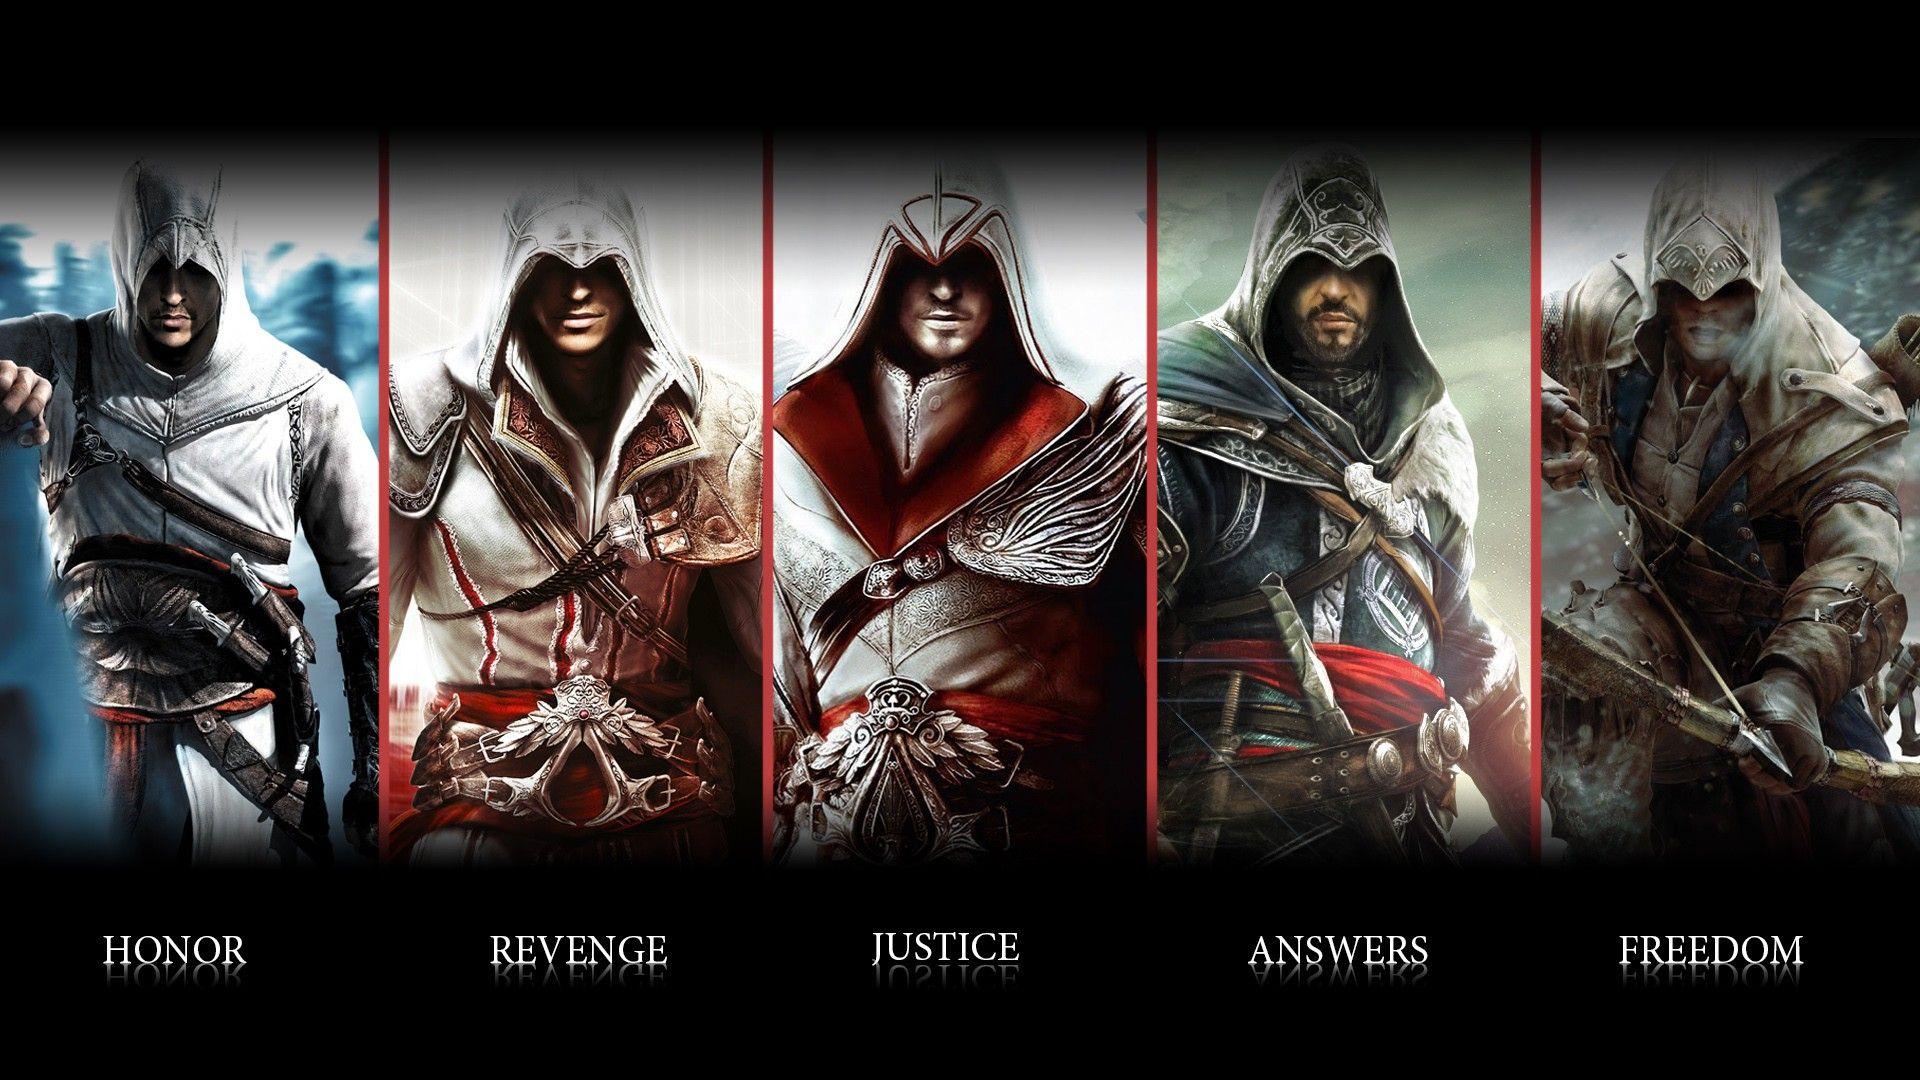 Assassins Creed Assassin S Creed Wallpaper Best Assassin S Creed Assassin S Creed Hd